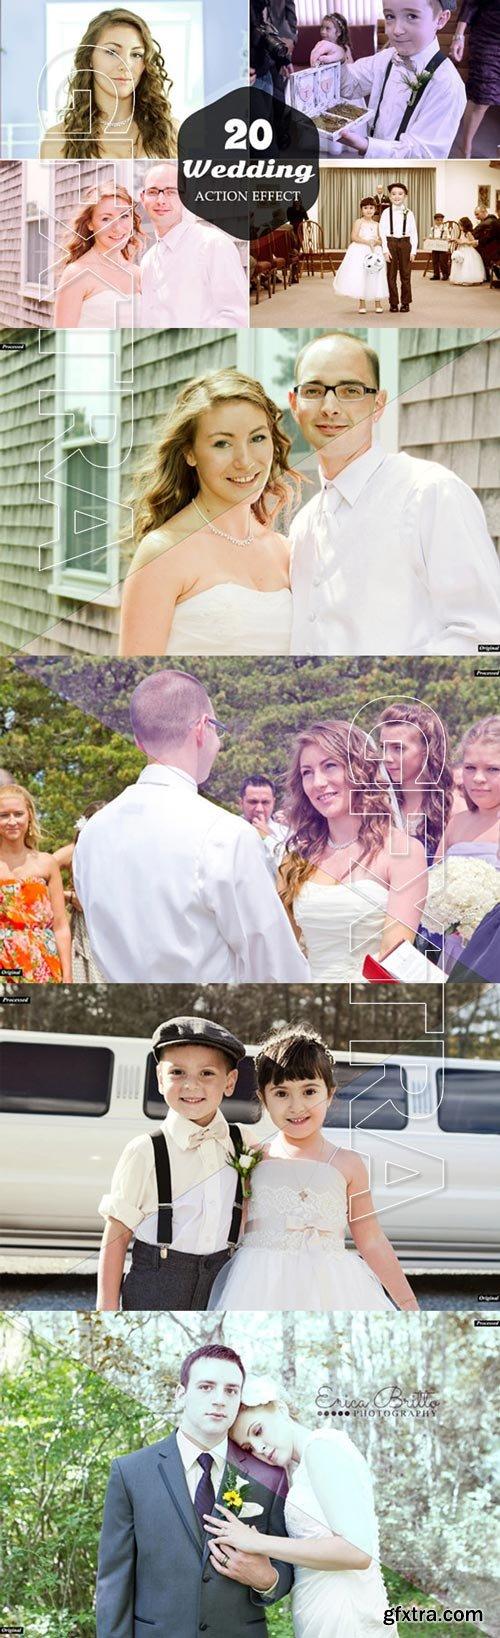 20 Wedding Action